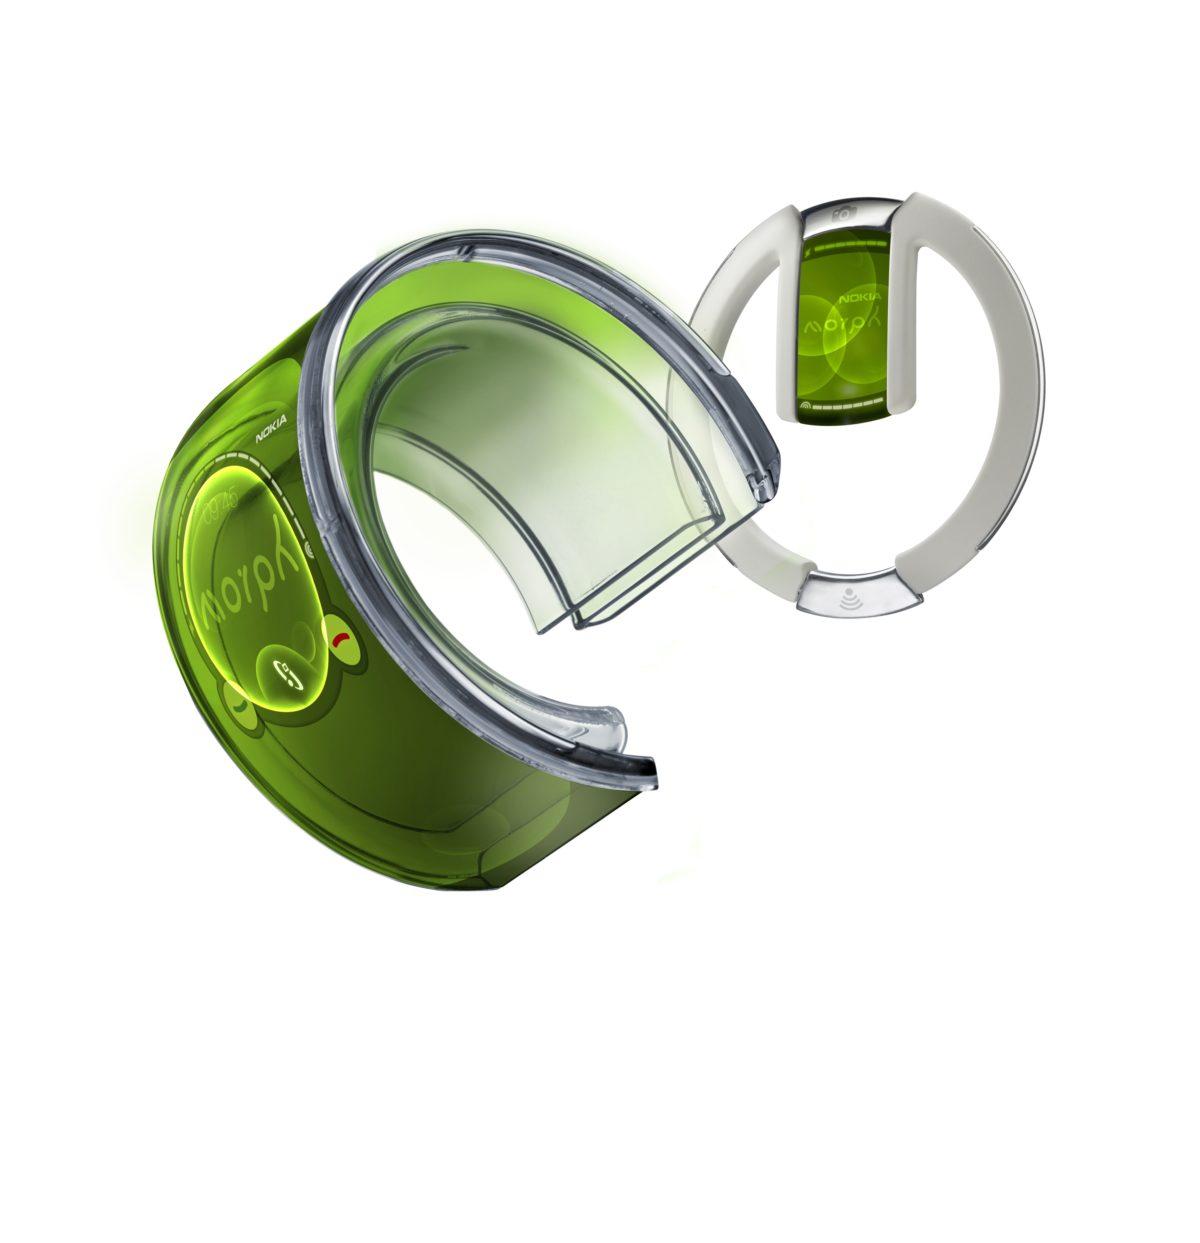 Intel Magic Concept Device by Smart Design. © Smart Design